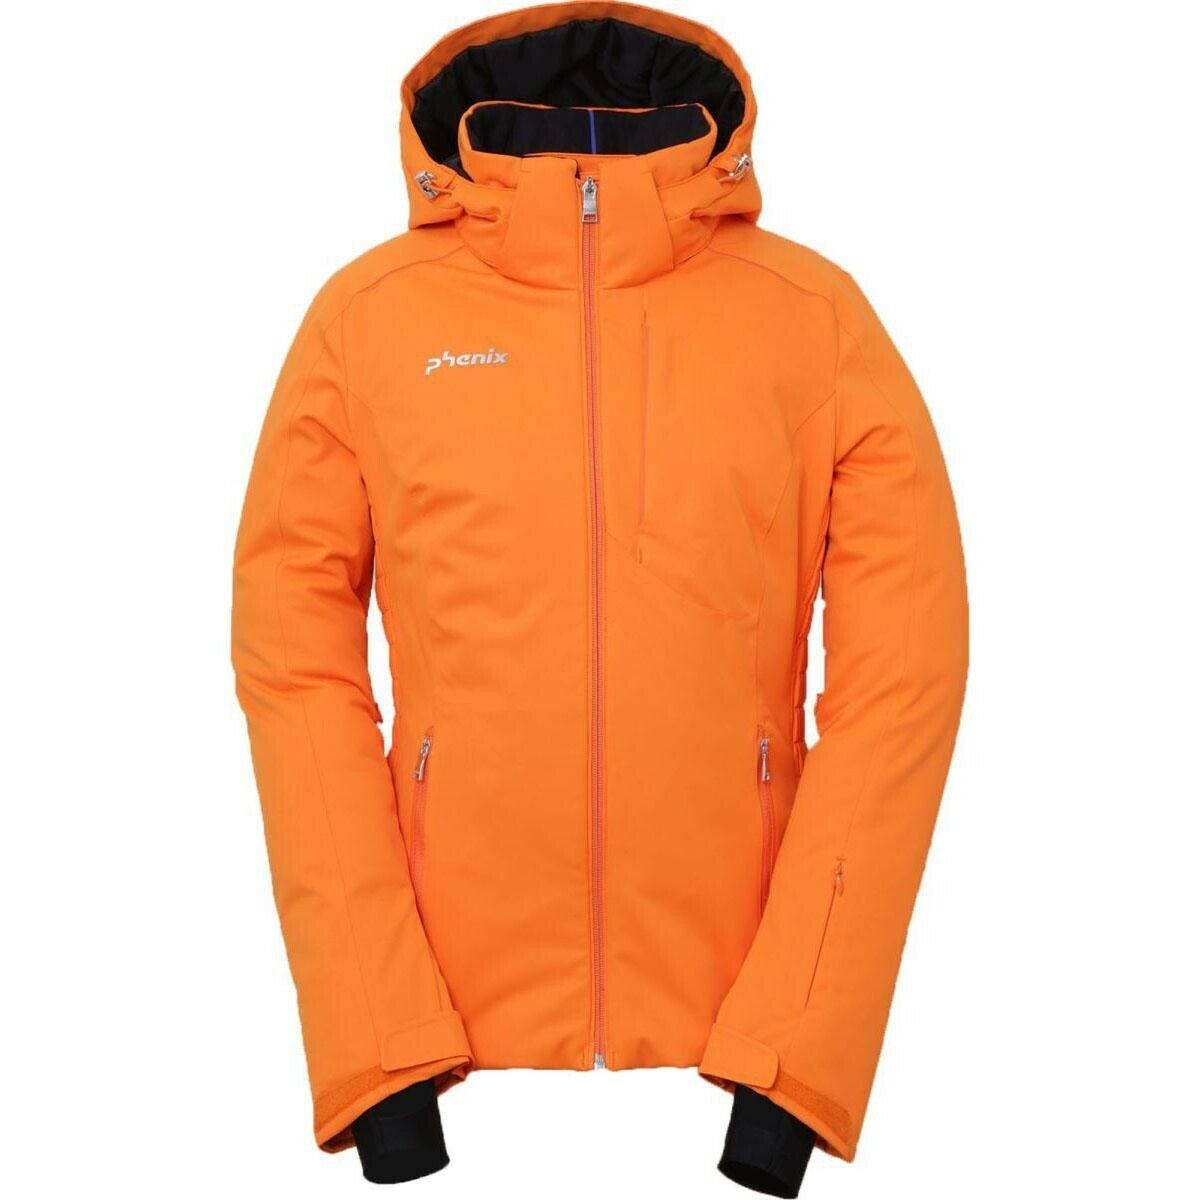 Phenix Maiko Jacket Damen Skijacke Orange